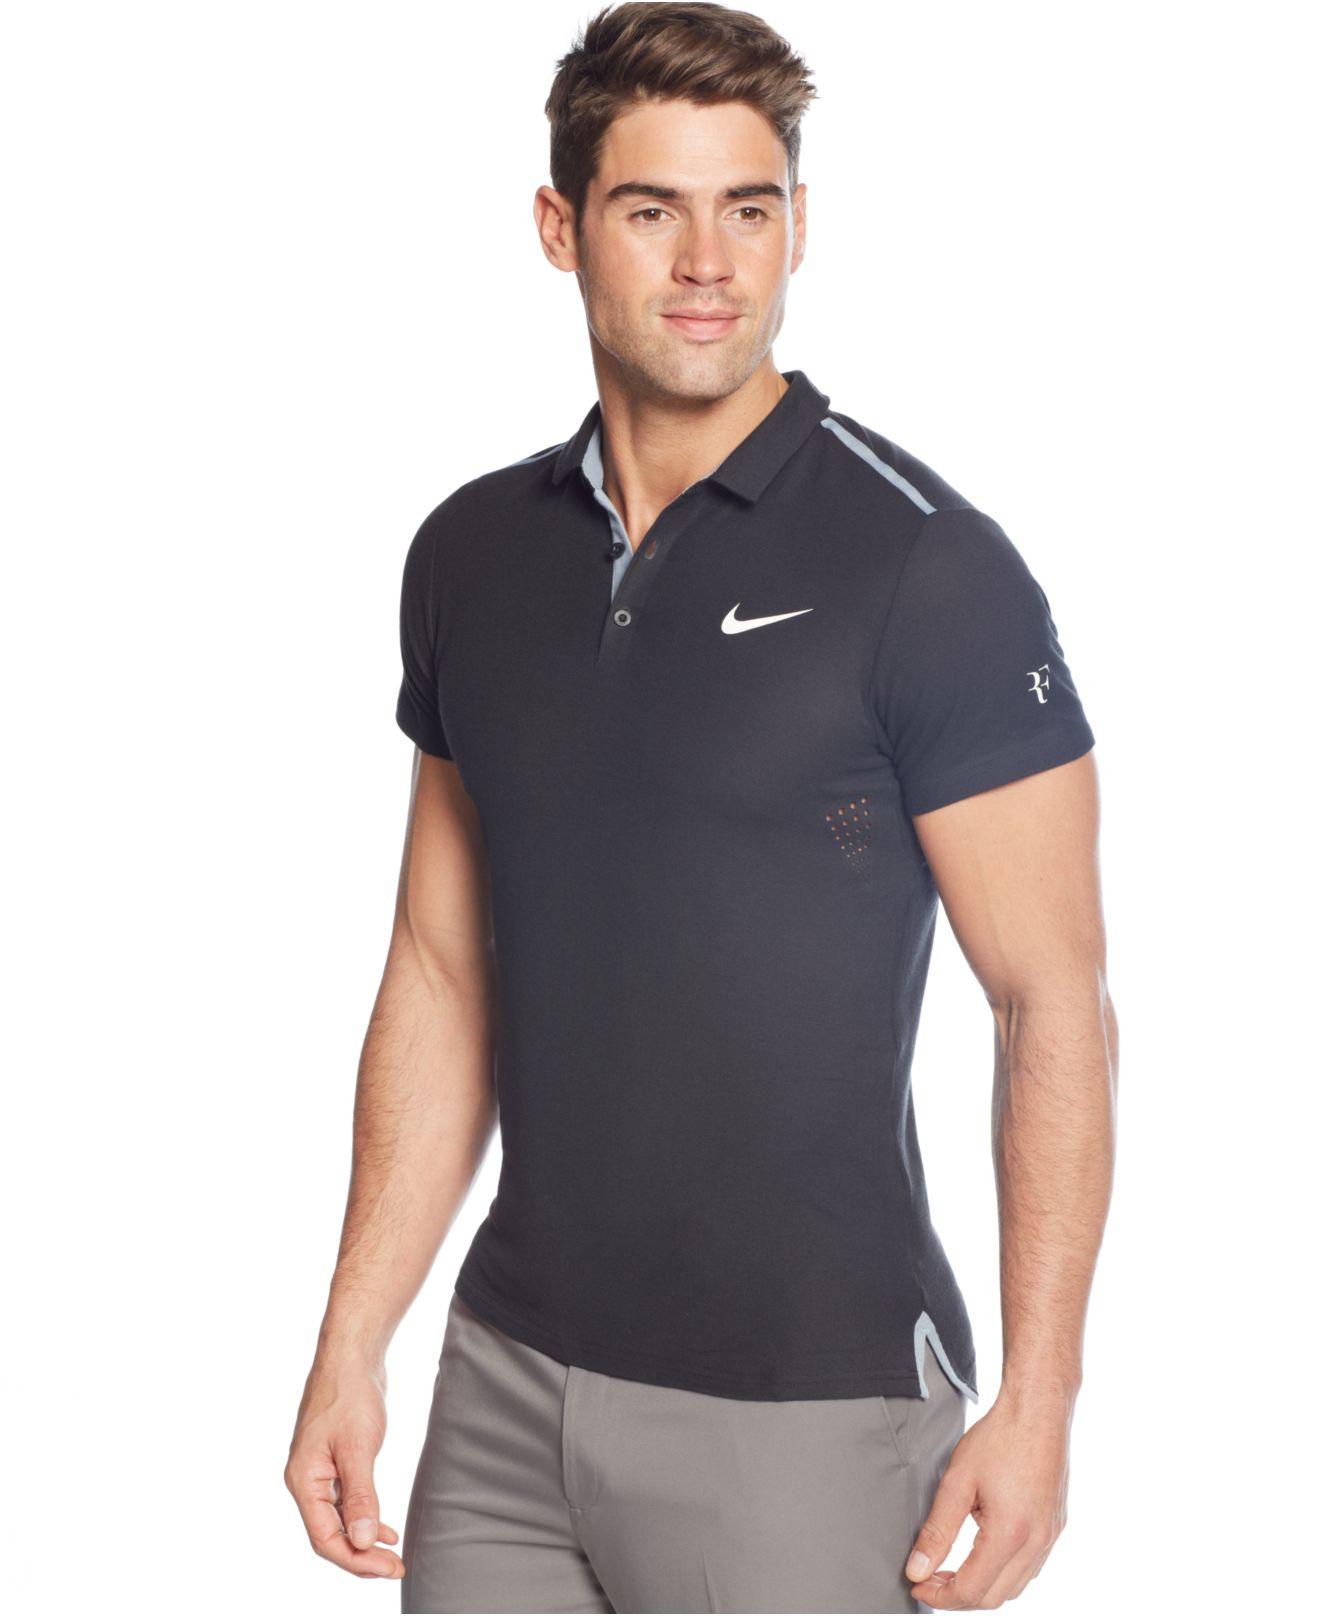 Nike Performance Polo >> Nike Black Advantage Premier Performance Polo For Men